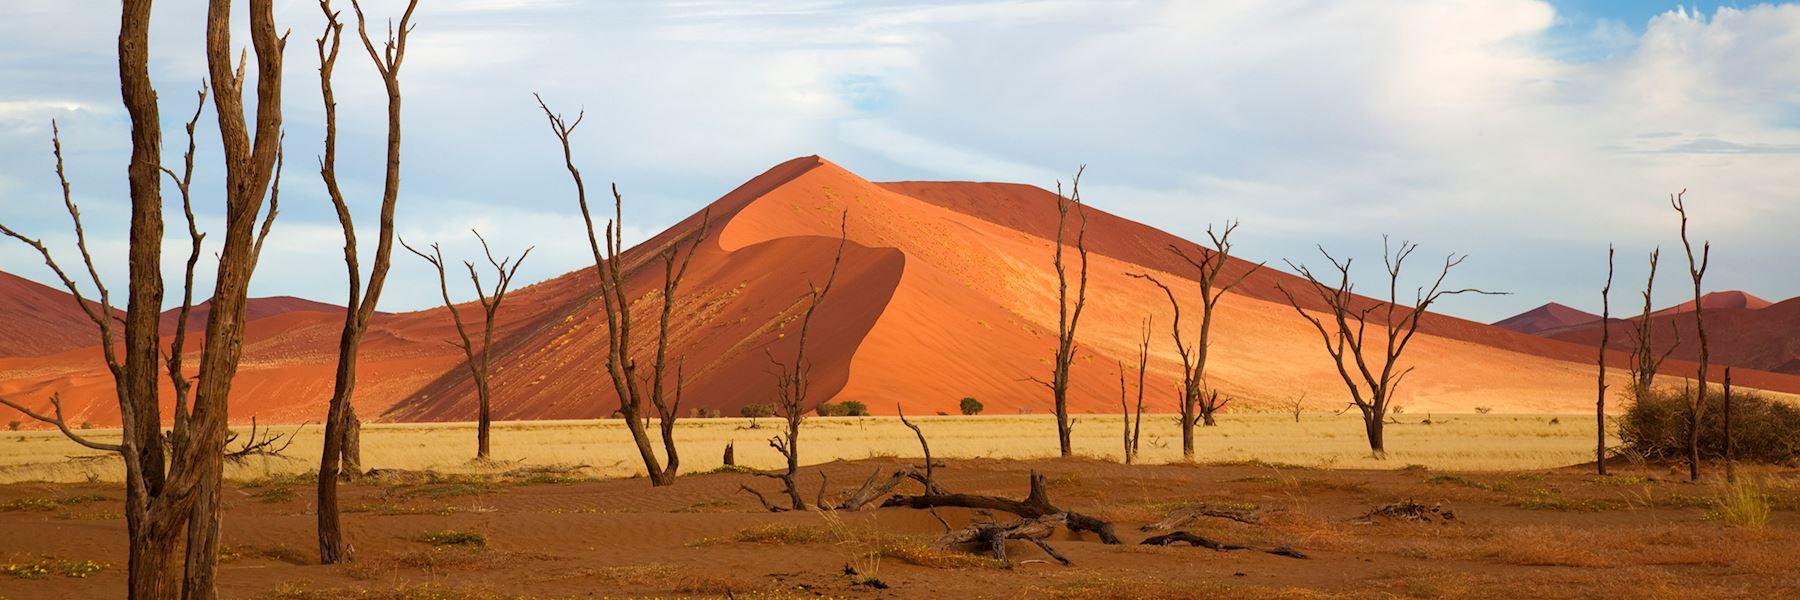 Namibia safaris & holidays